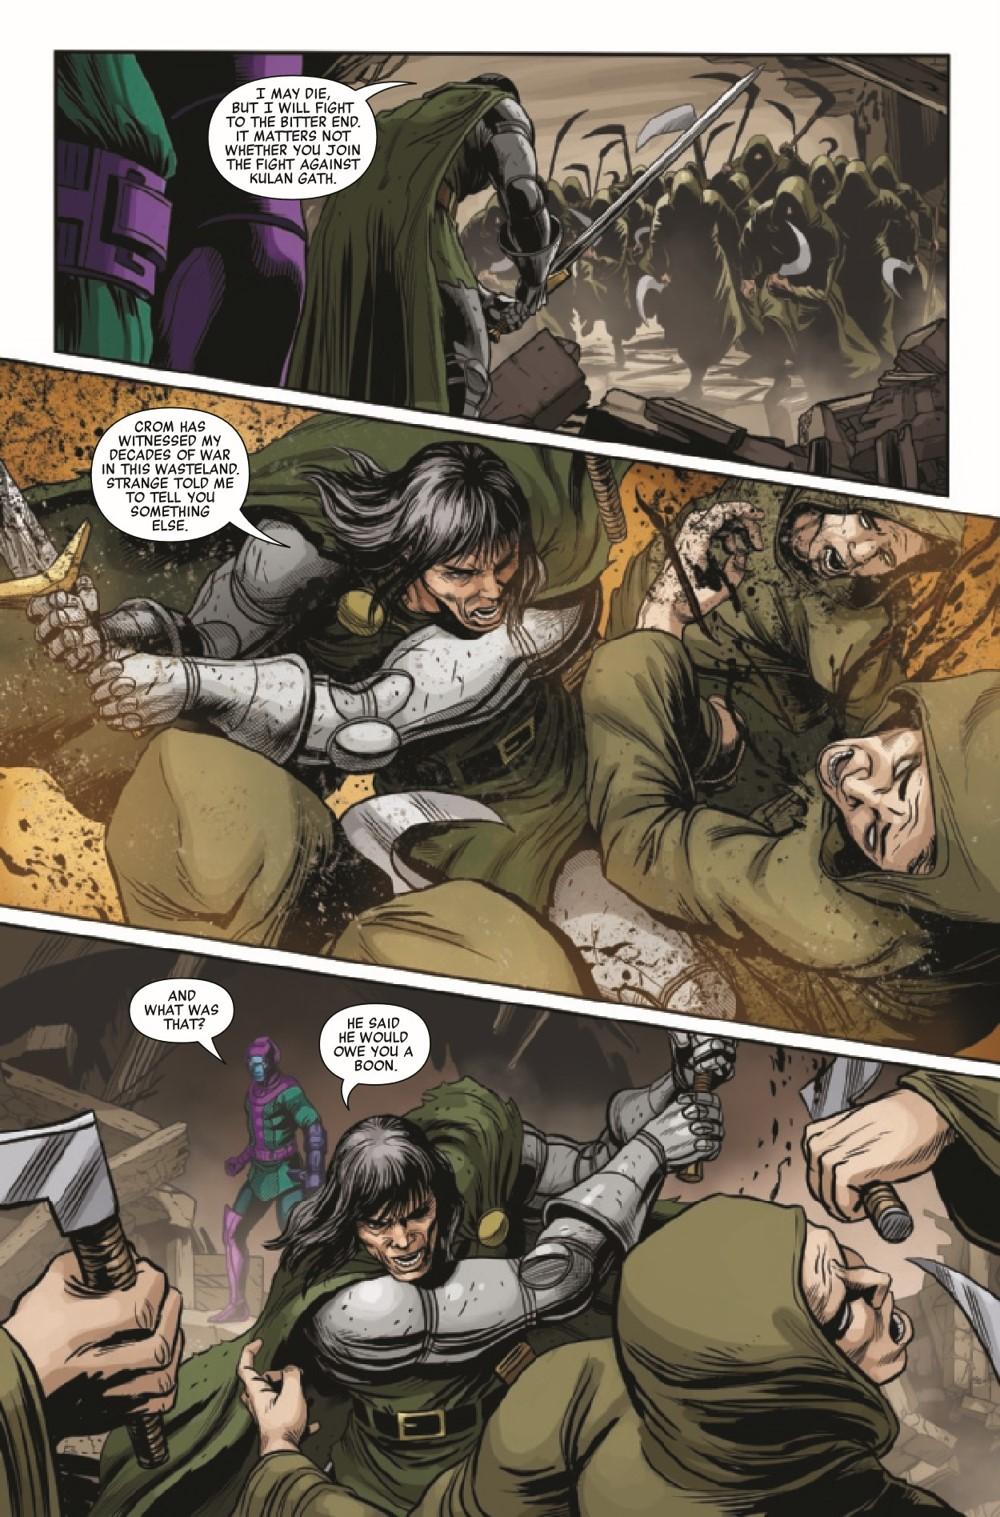 SAVAVEN2019025_Preview-4 ComicList Previews: SAVAGE AVENGERS #25